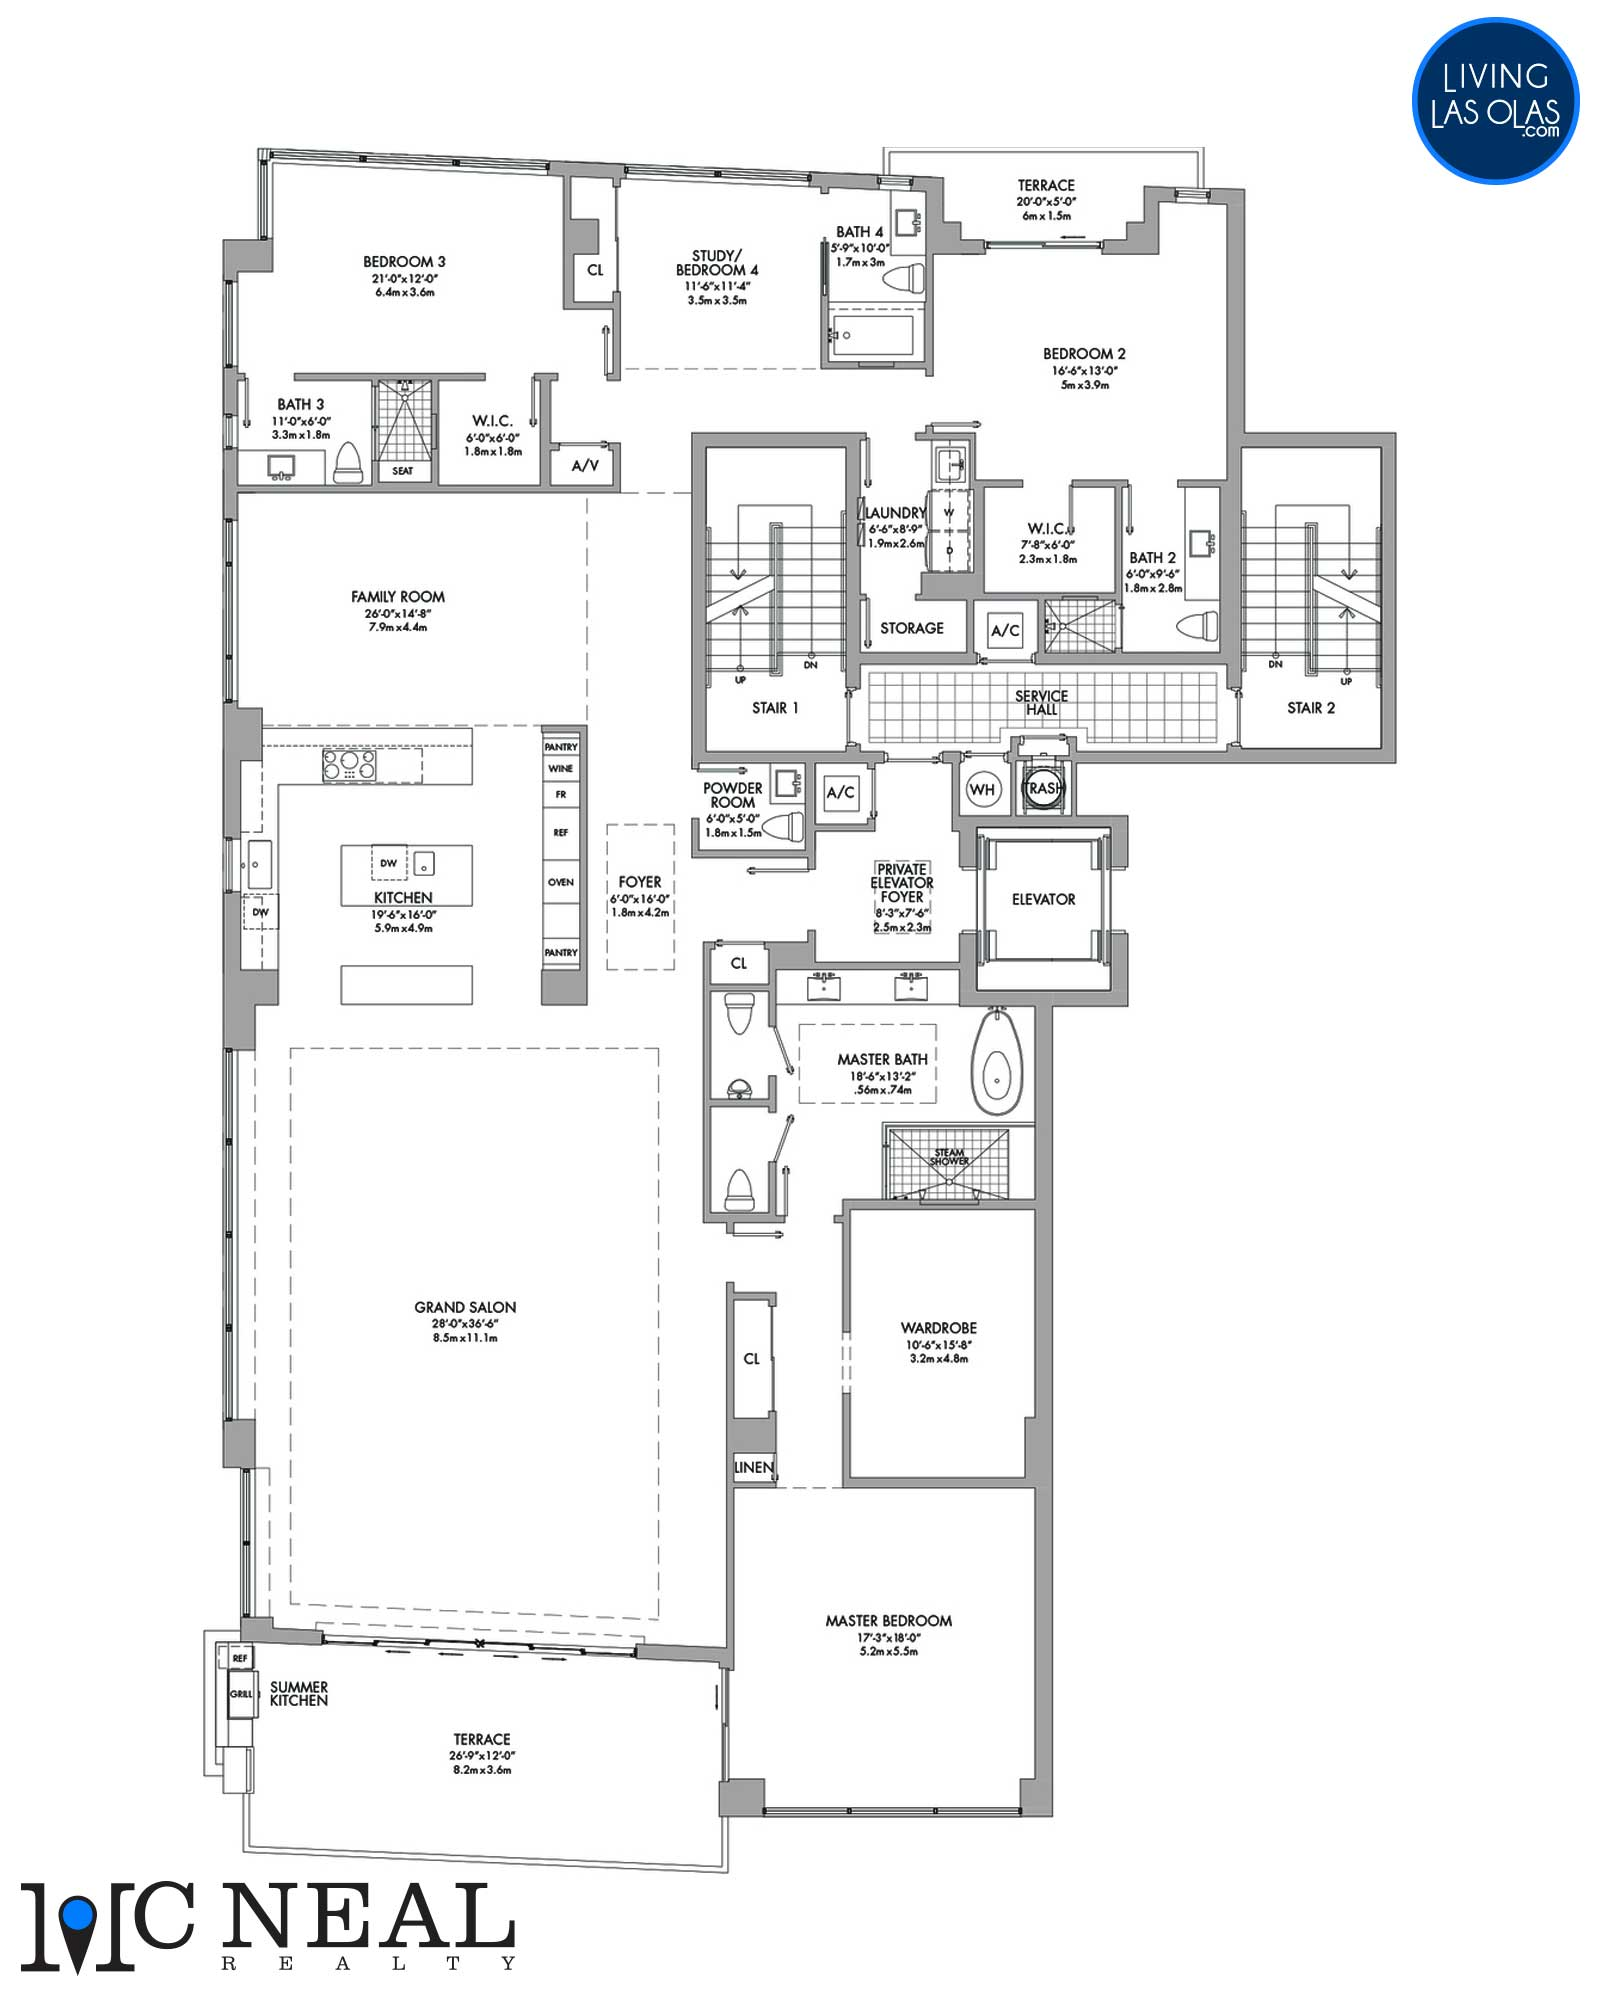 353 Sunset Condos Floor Plan 01